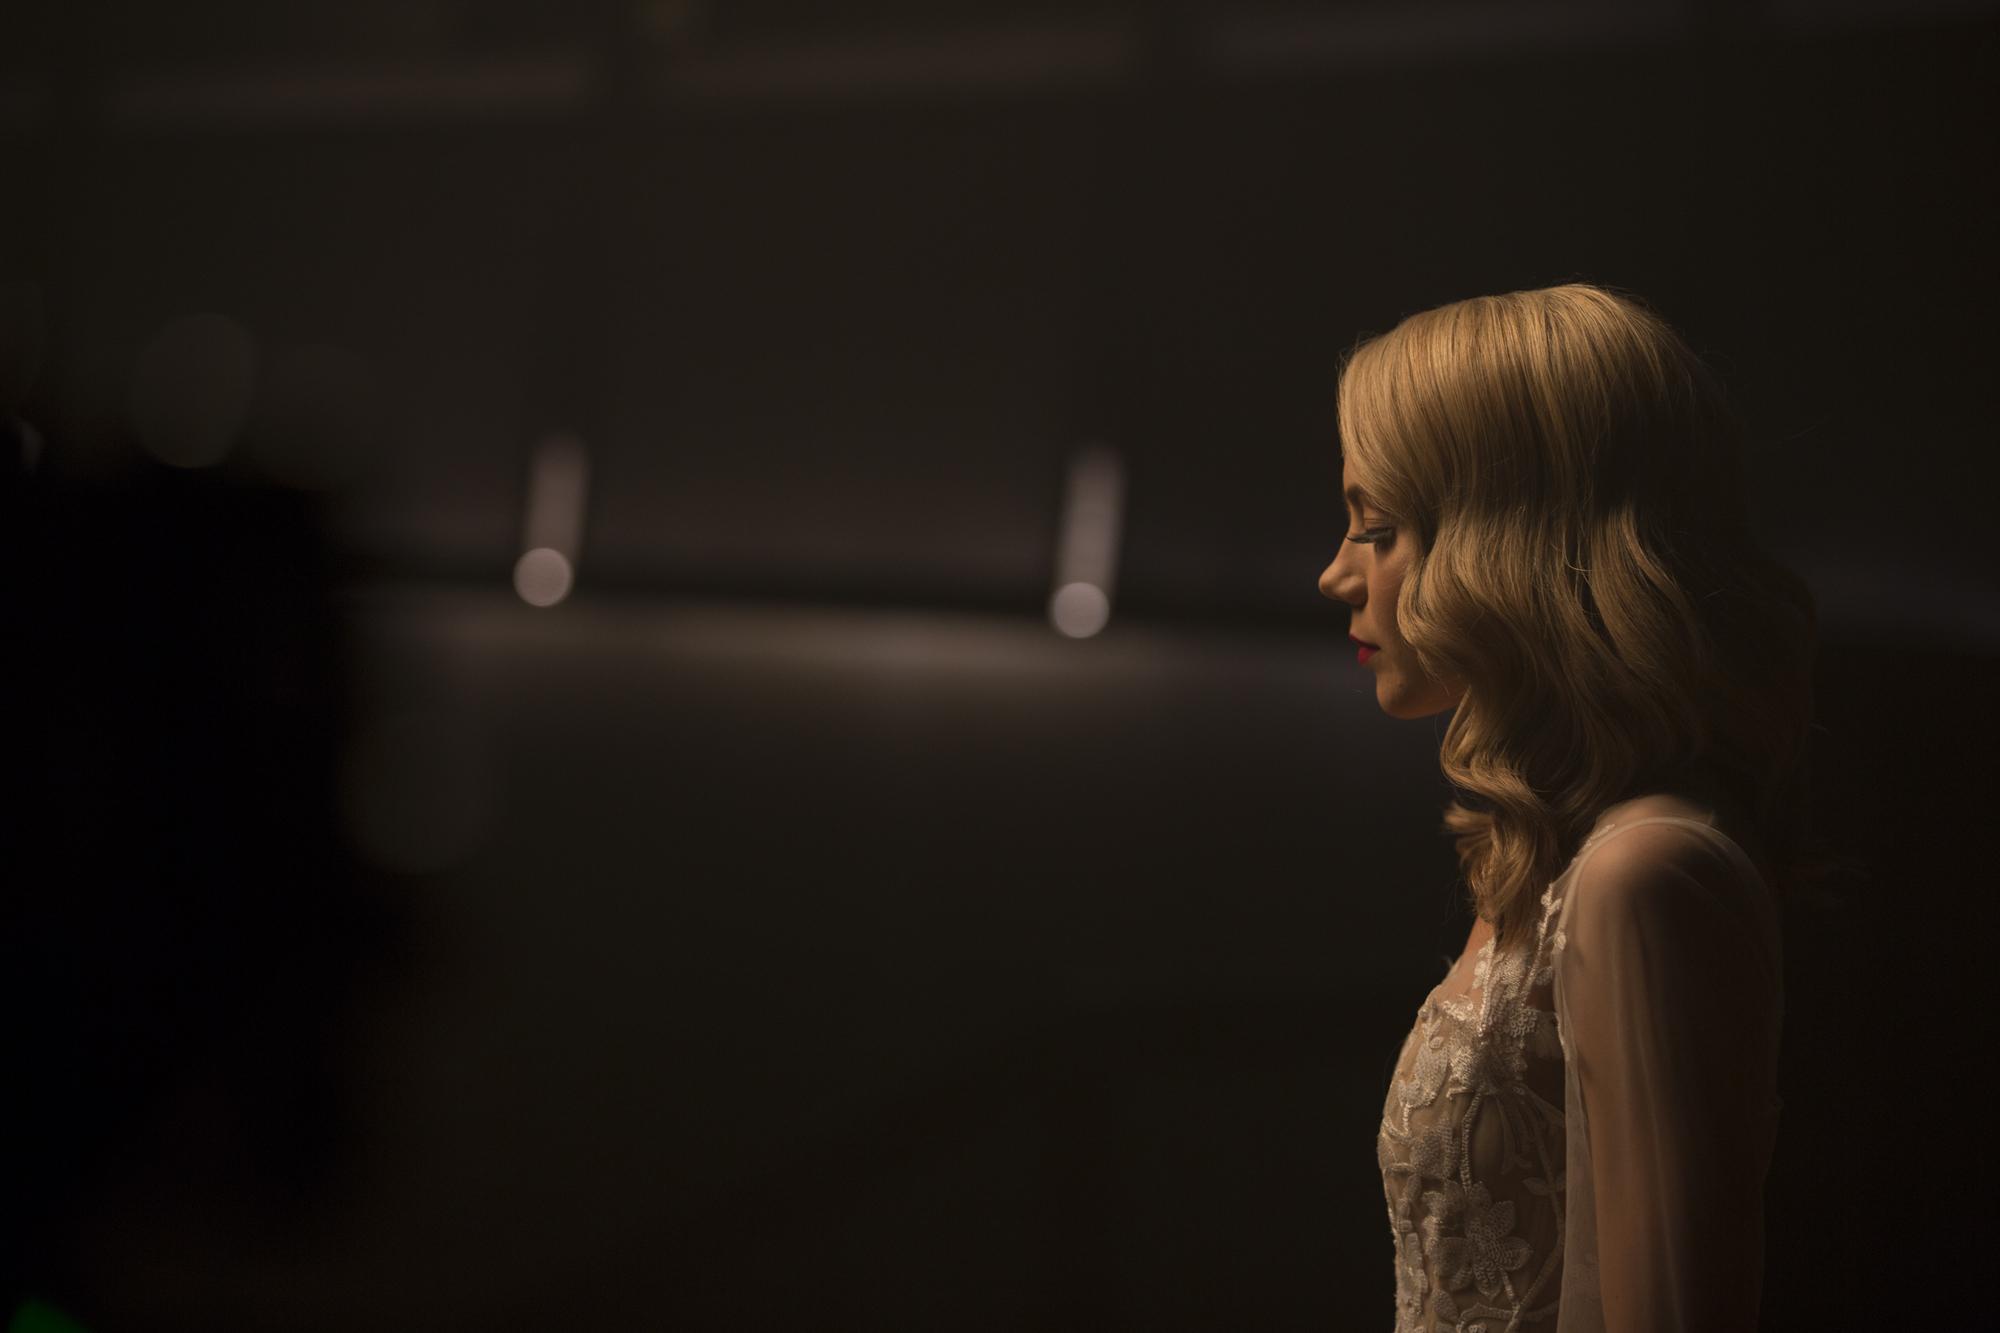 Go Behind the Scenes of Danielle Bradbery's Powerful 'Worth It' Video